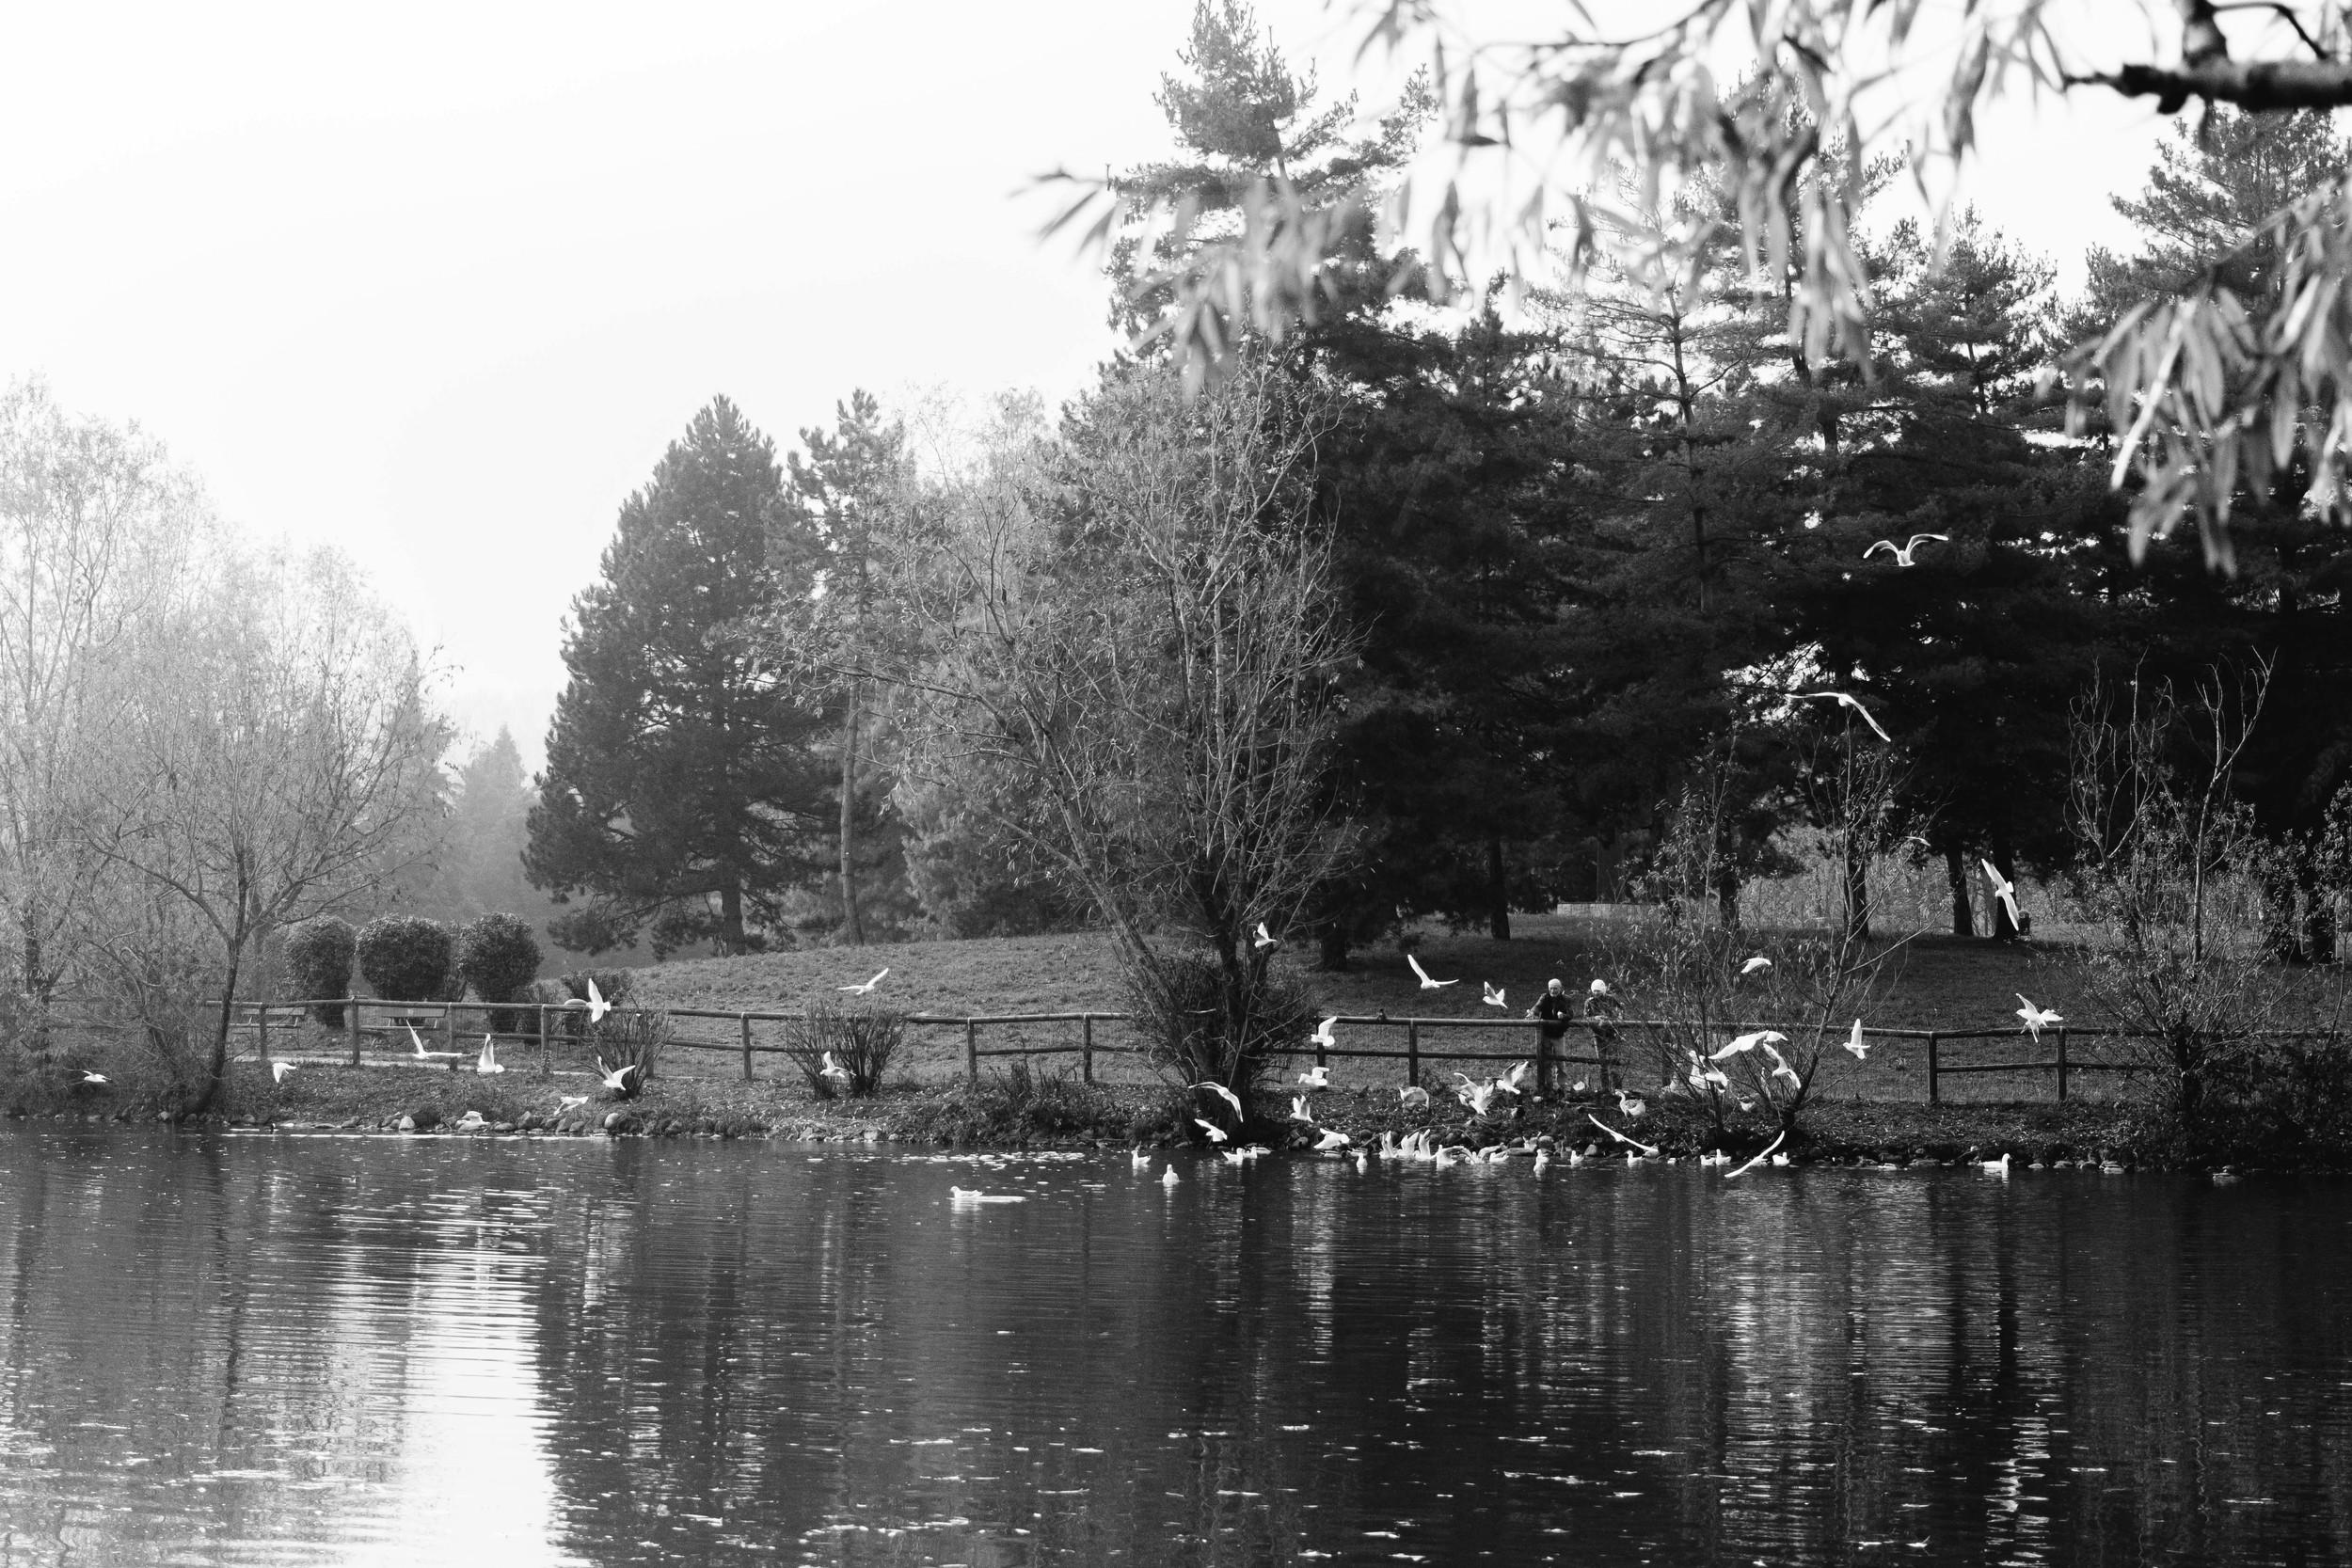 Fall fotografia autunno torino parco cani pellerina